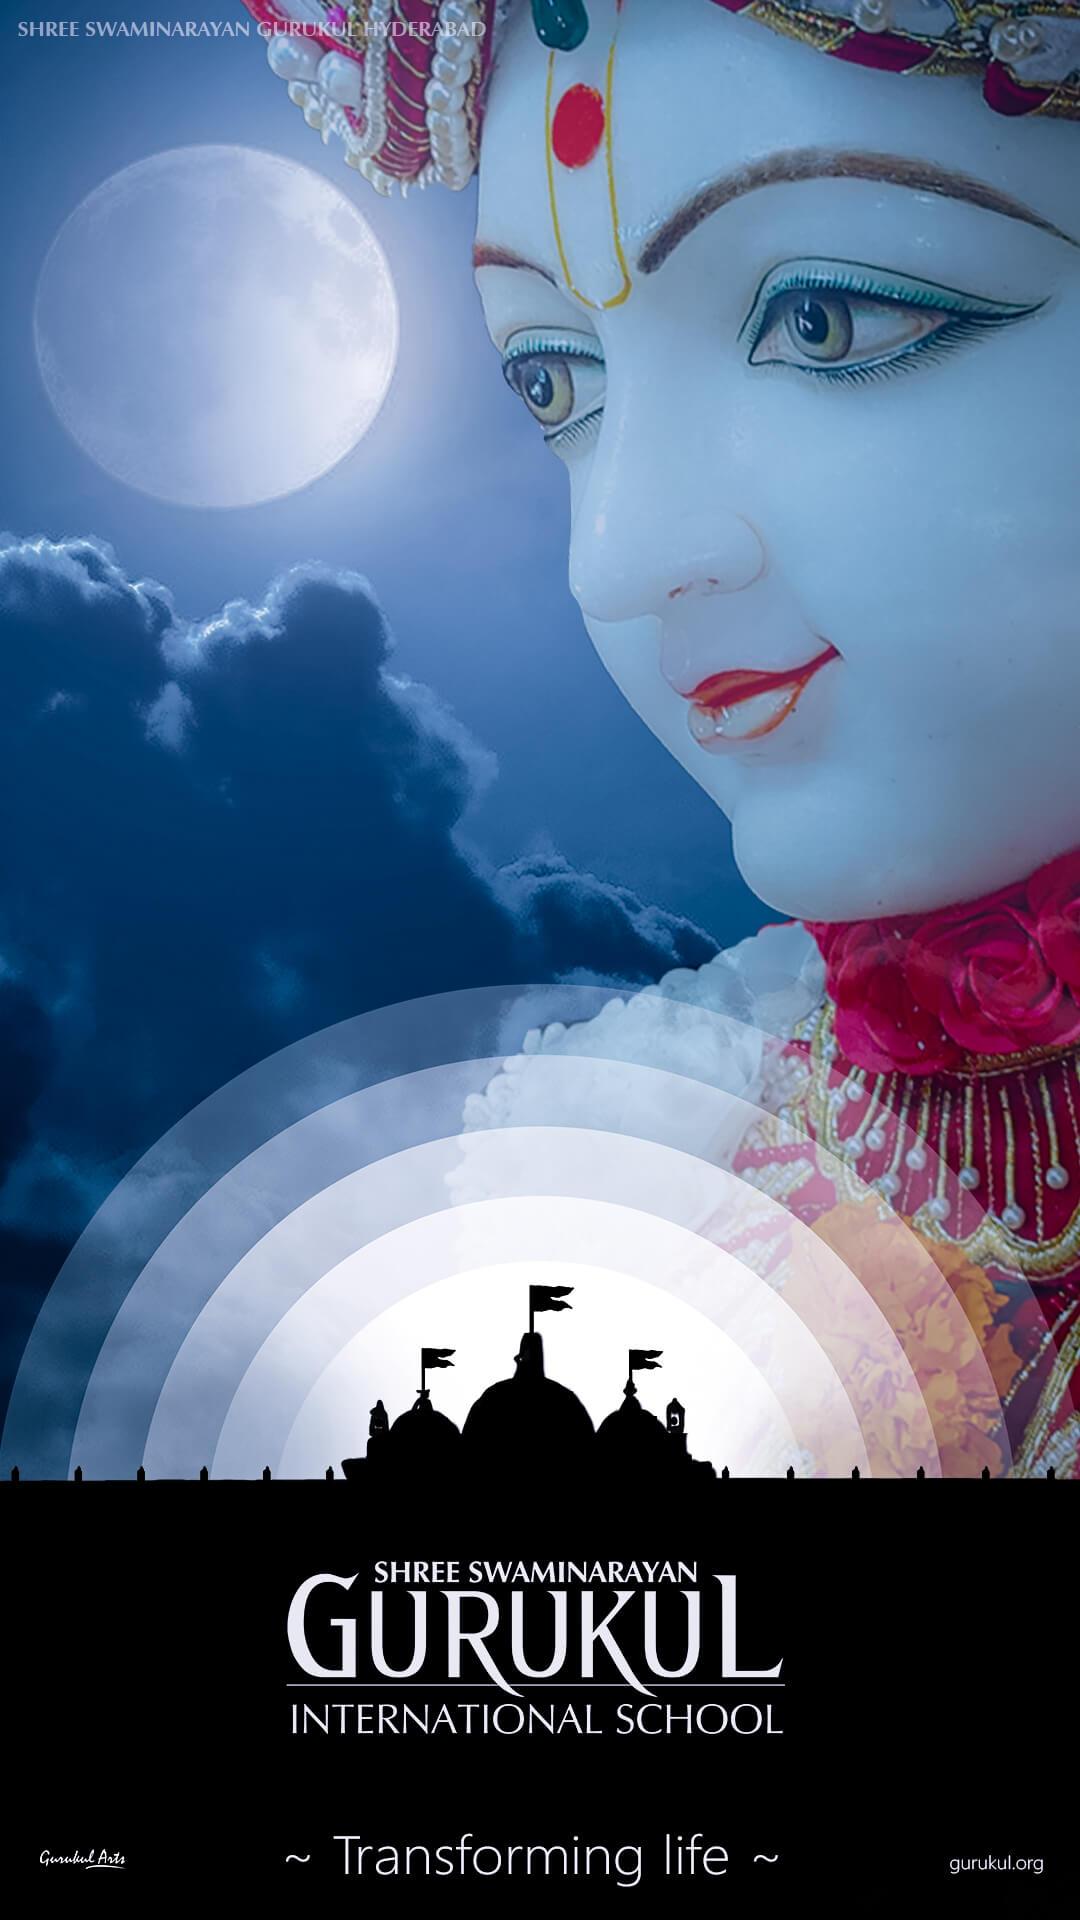 Swaminarayan Mobile Wallpaper hd